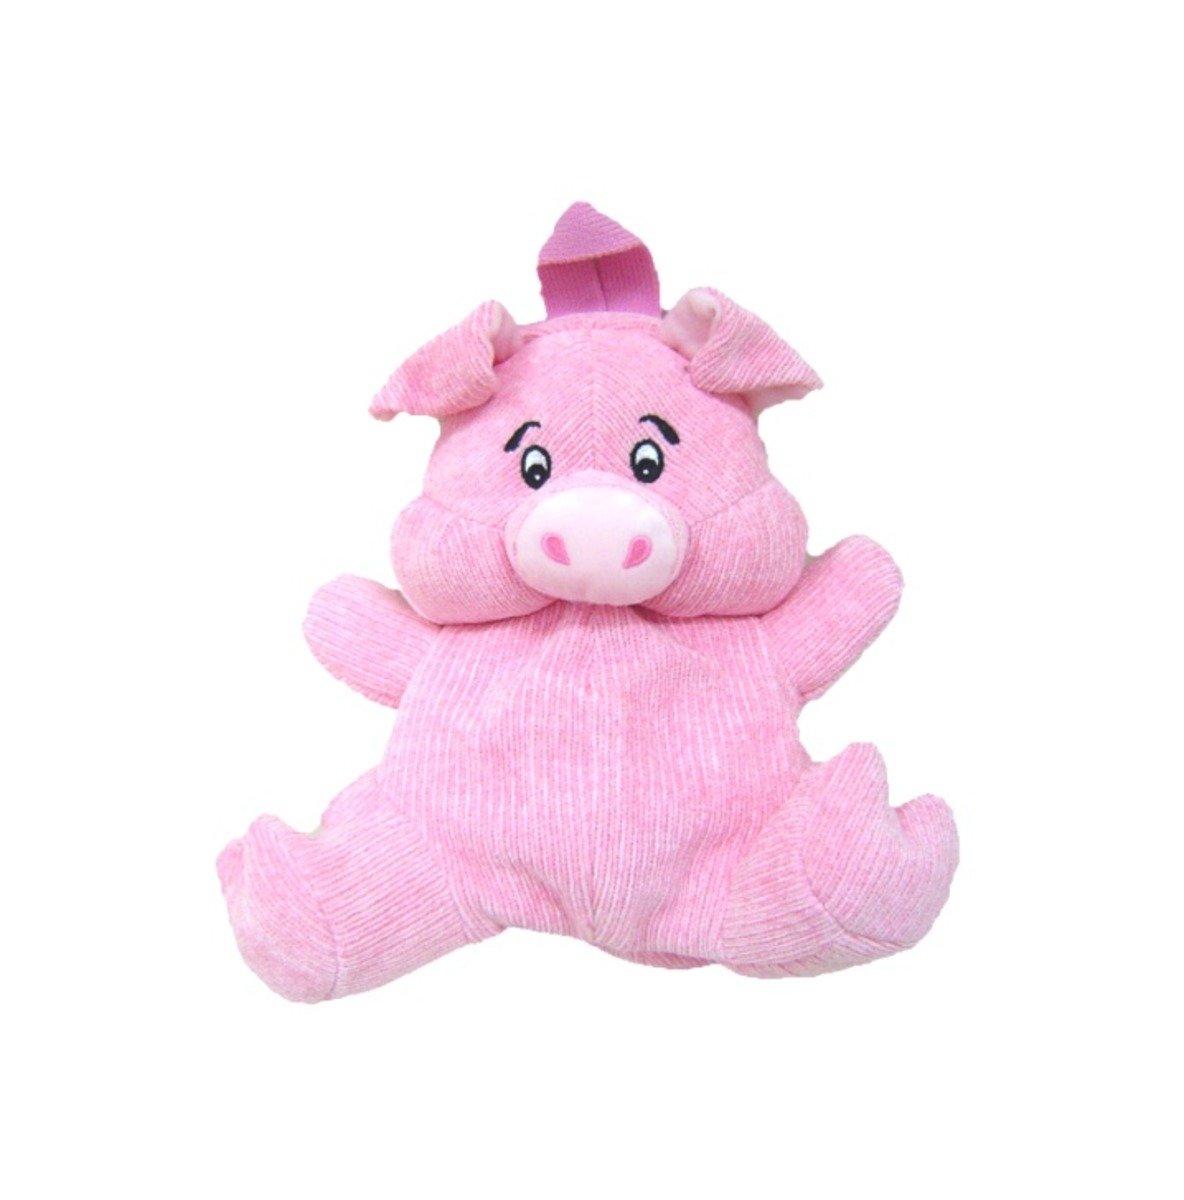 COLOR RICH -  動物造型豬豬背包(33cm) - 3F895